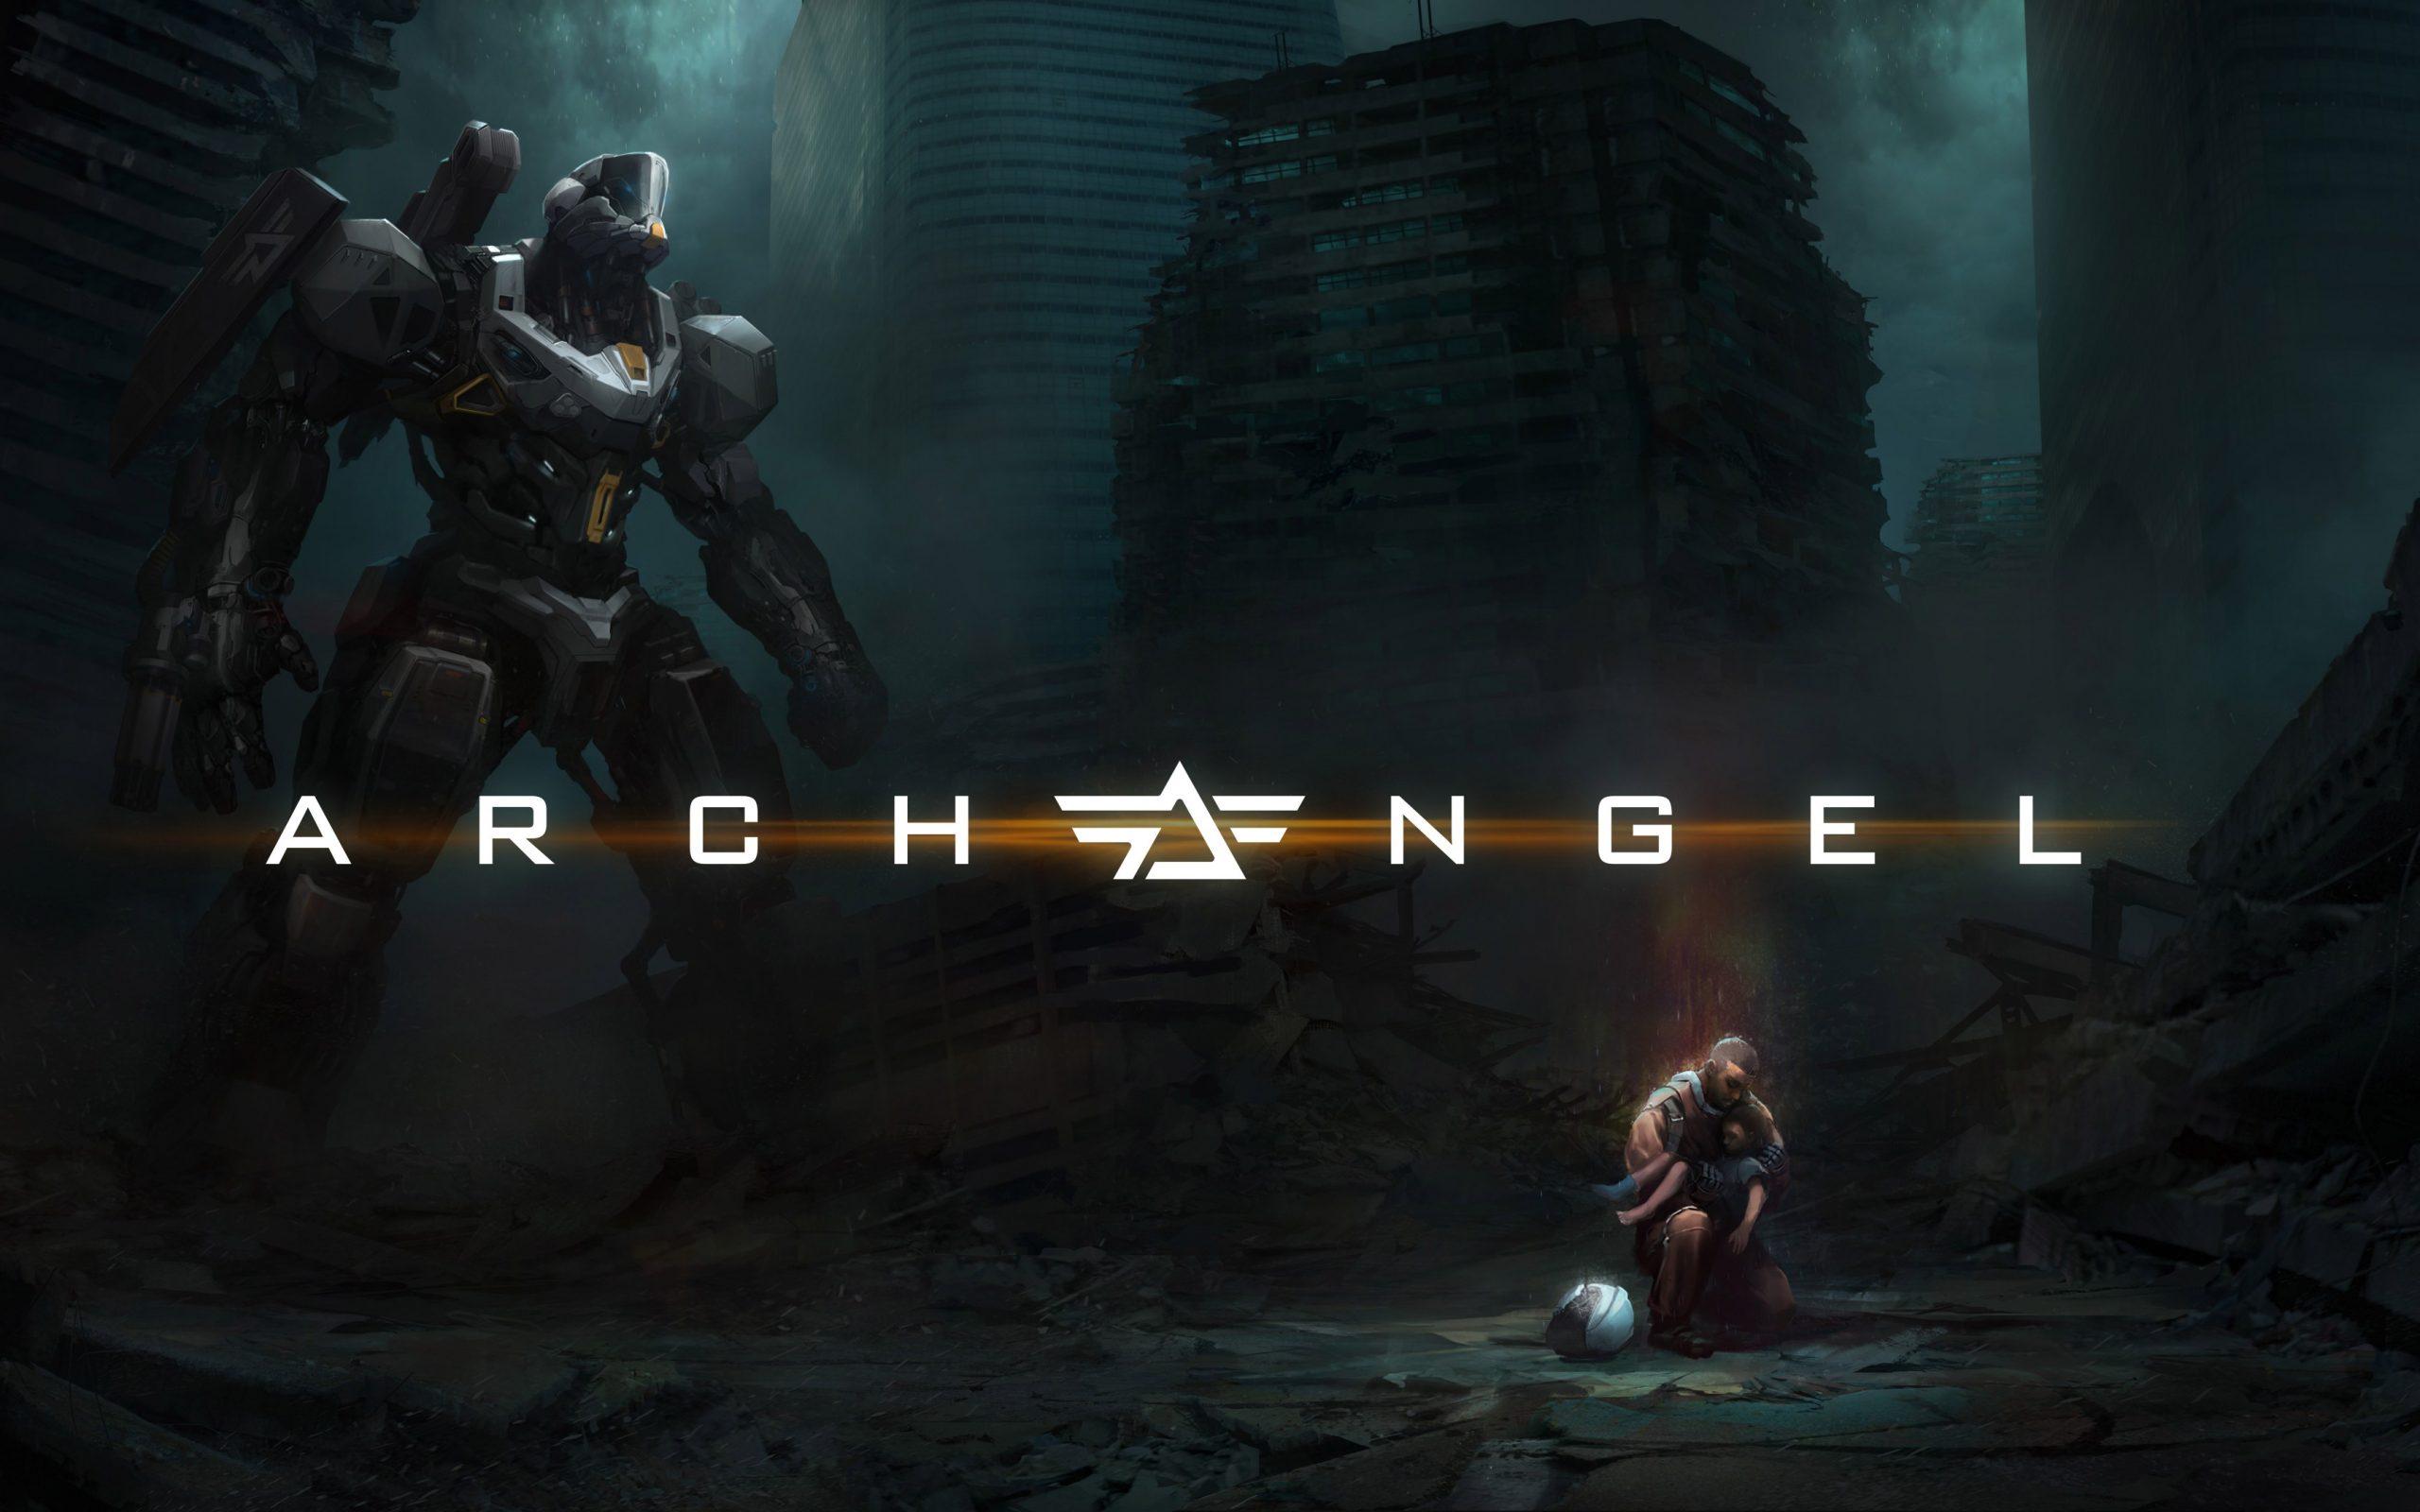 Archangel Game 4k Wallpaper Hd Wallpaper Background